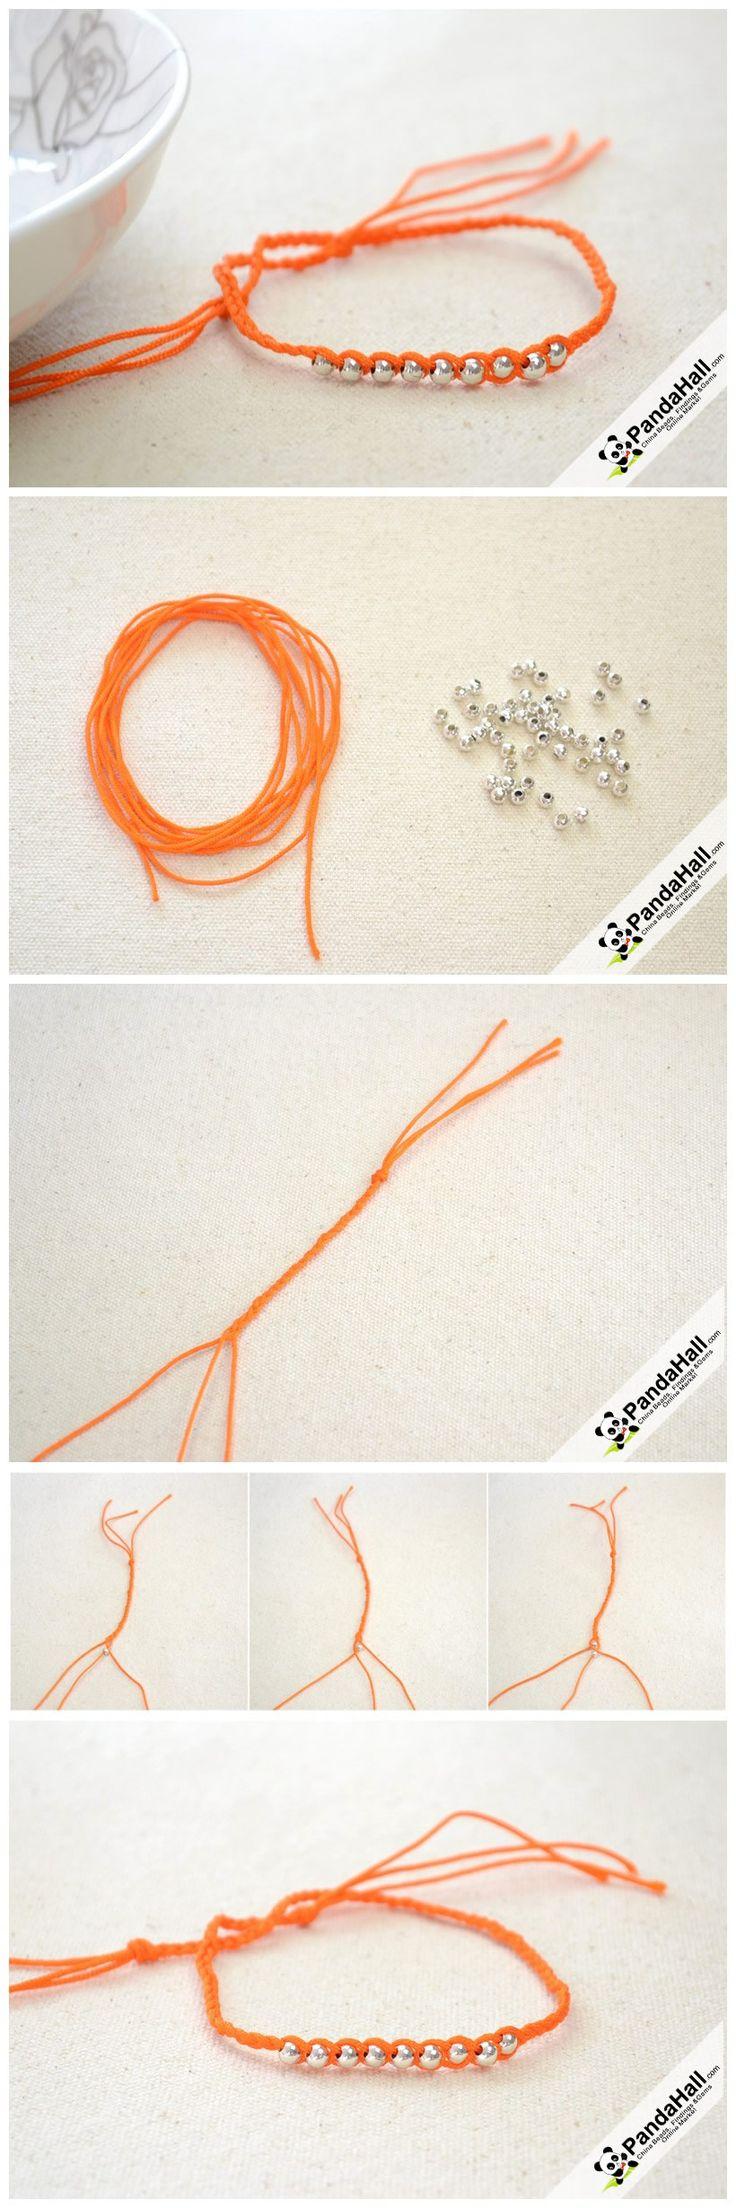 Easy To Make Friendship Bracelet  How To Make String Bracelets Step By  Step From Pandahall